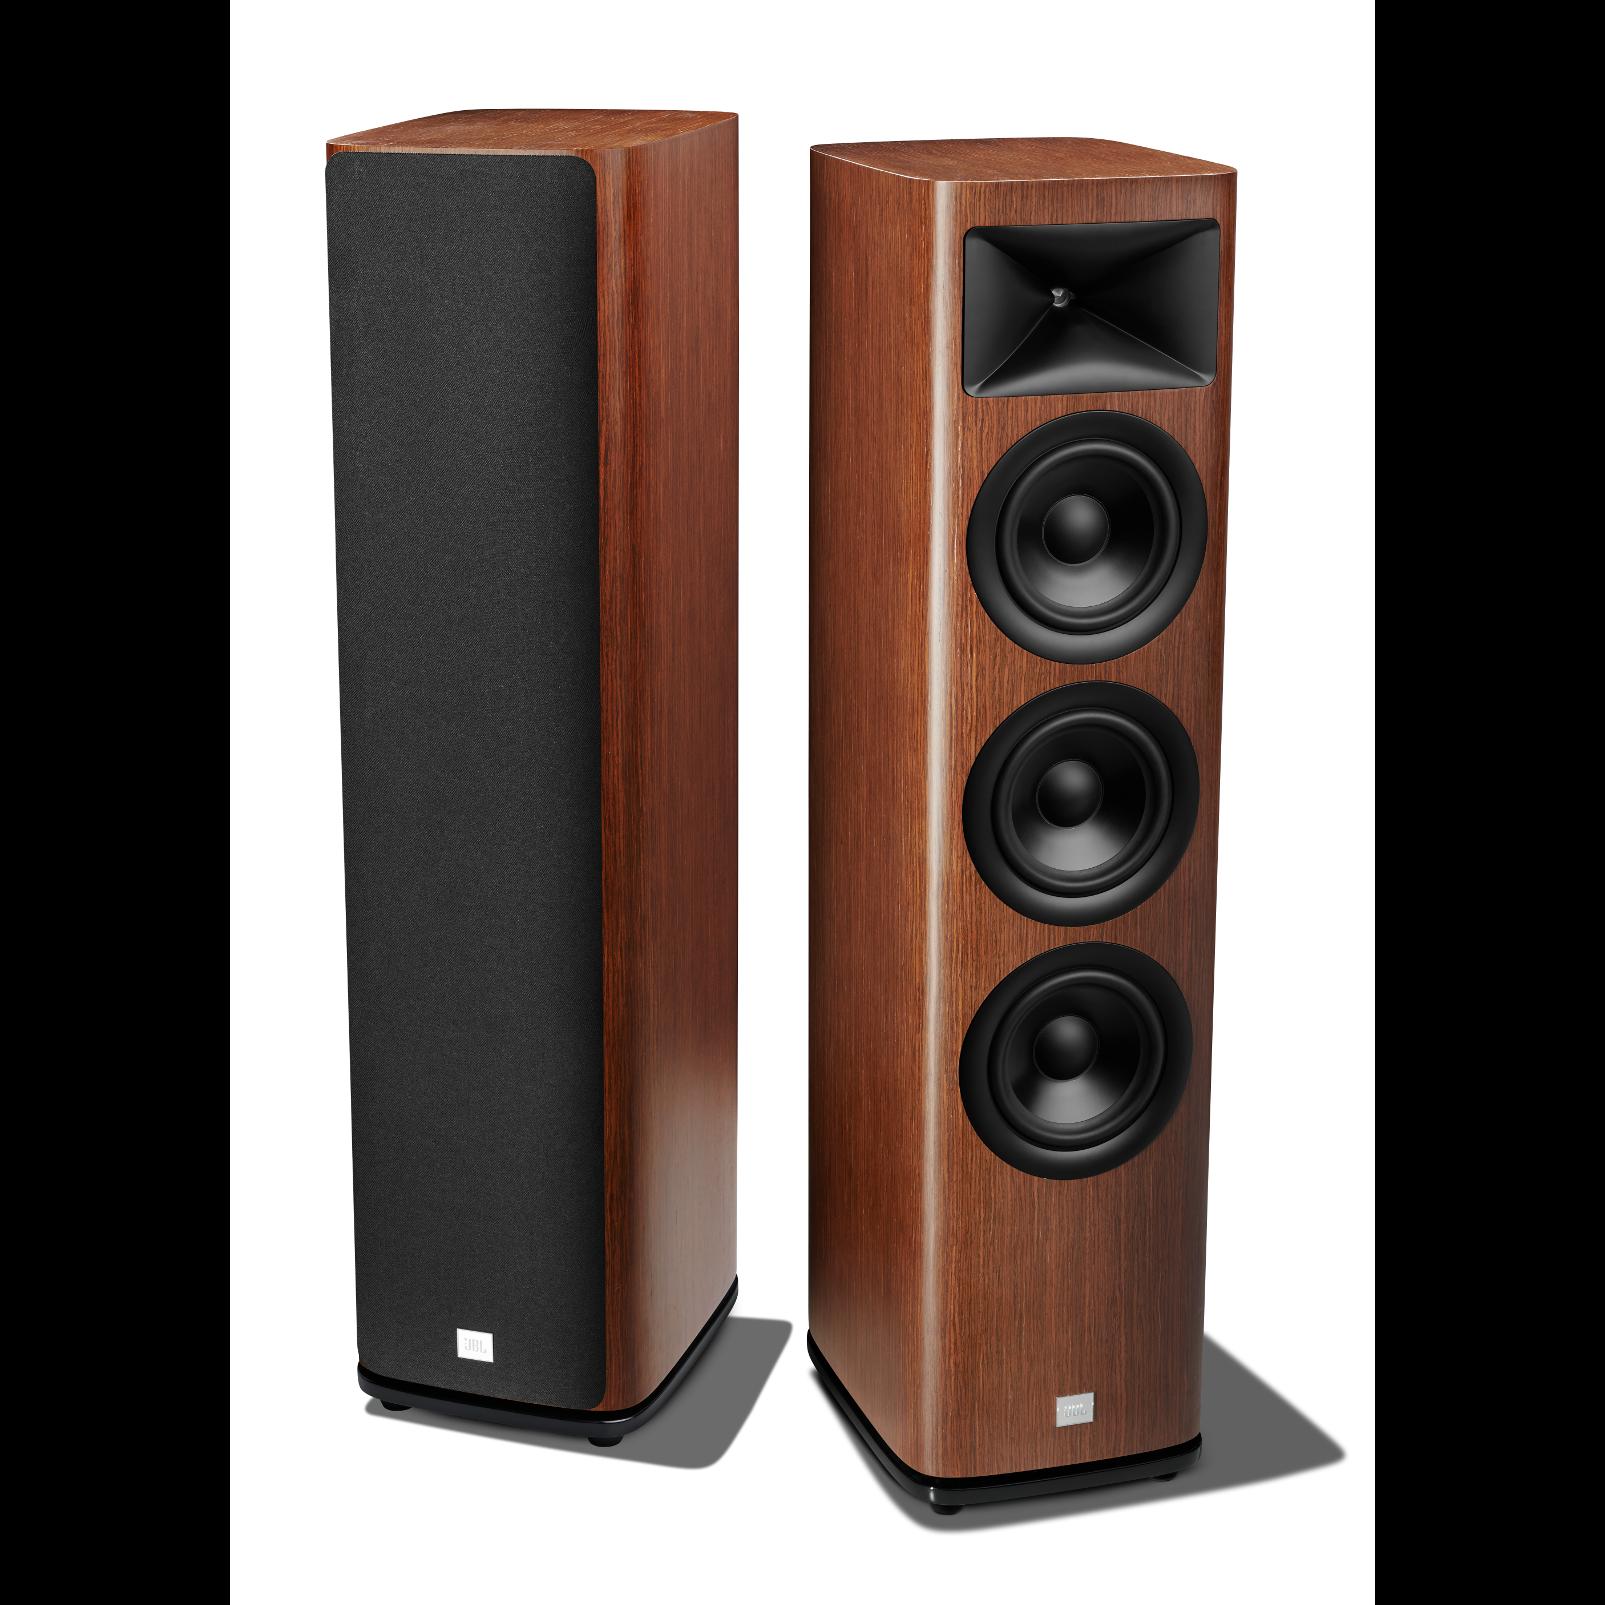 HDI-3600 - Walnut - 2 ½-way Triple 6.5-inch (165mm) Floorstanding Loudspeaker - Detailshot 1